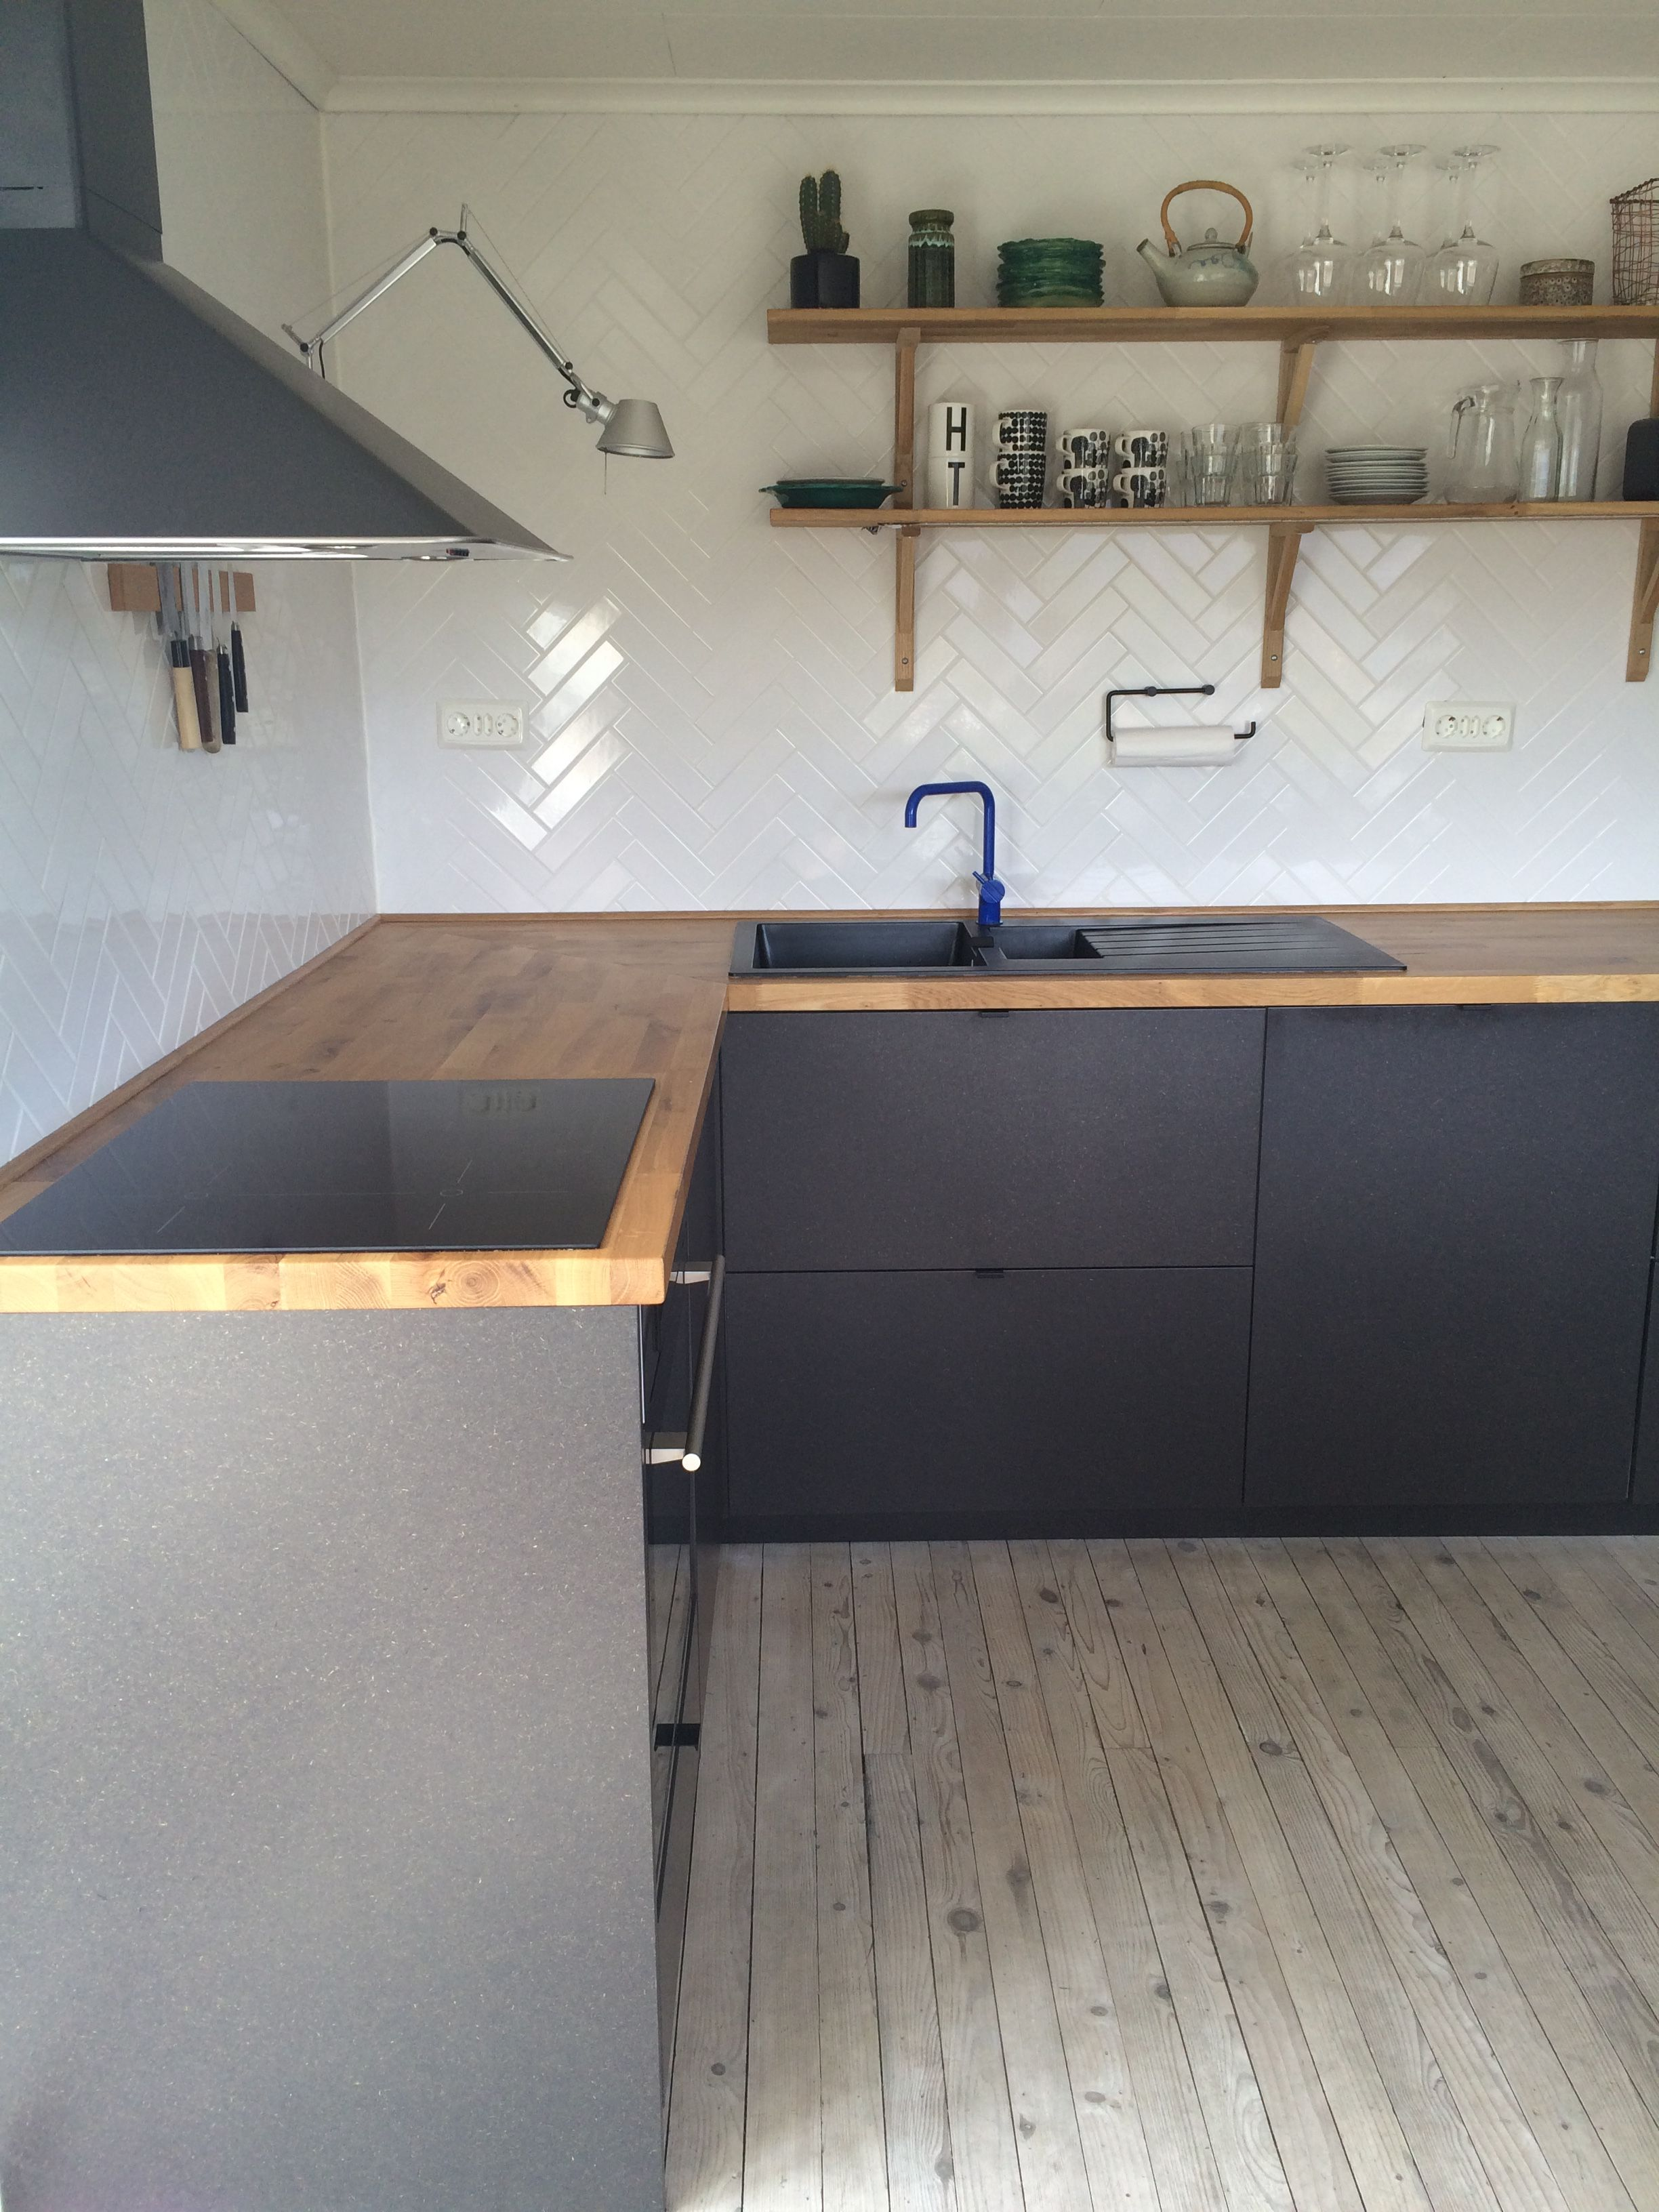 valchromat ikea kitchen studio10 kitchen w 2019. Black Bedroom Furniture Sets. Home Design Ideas